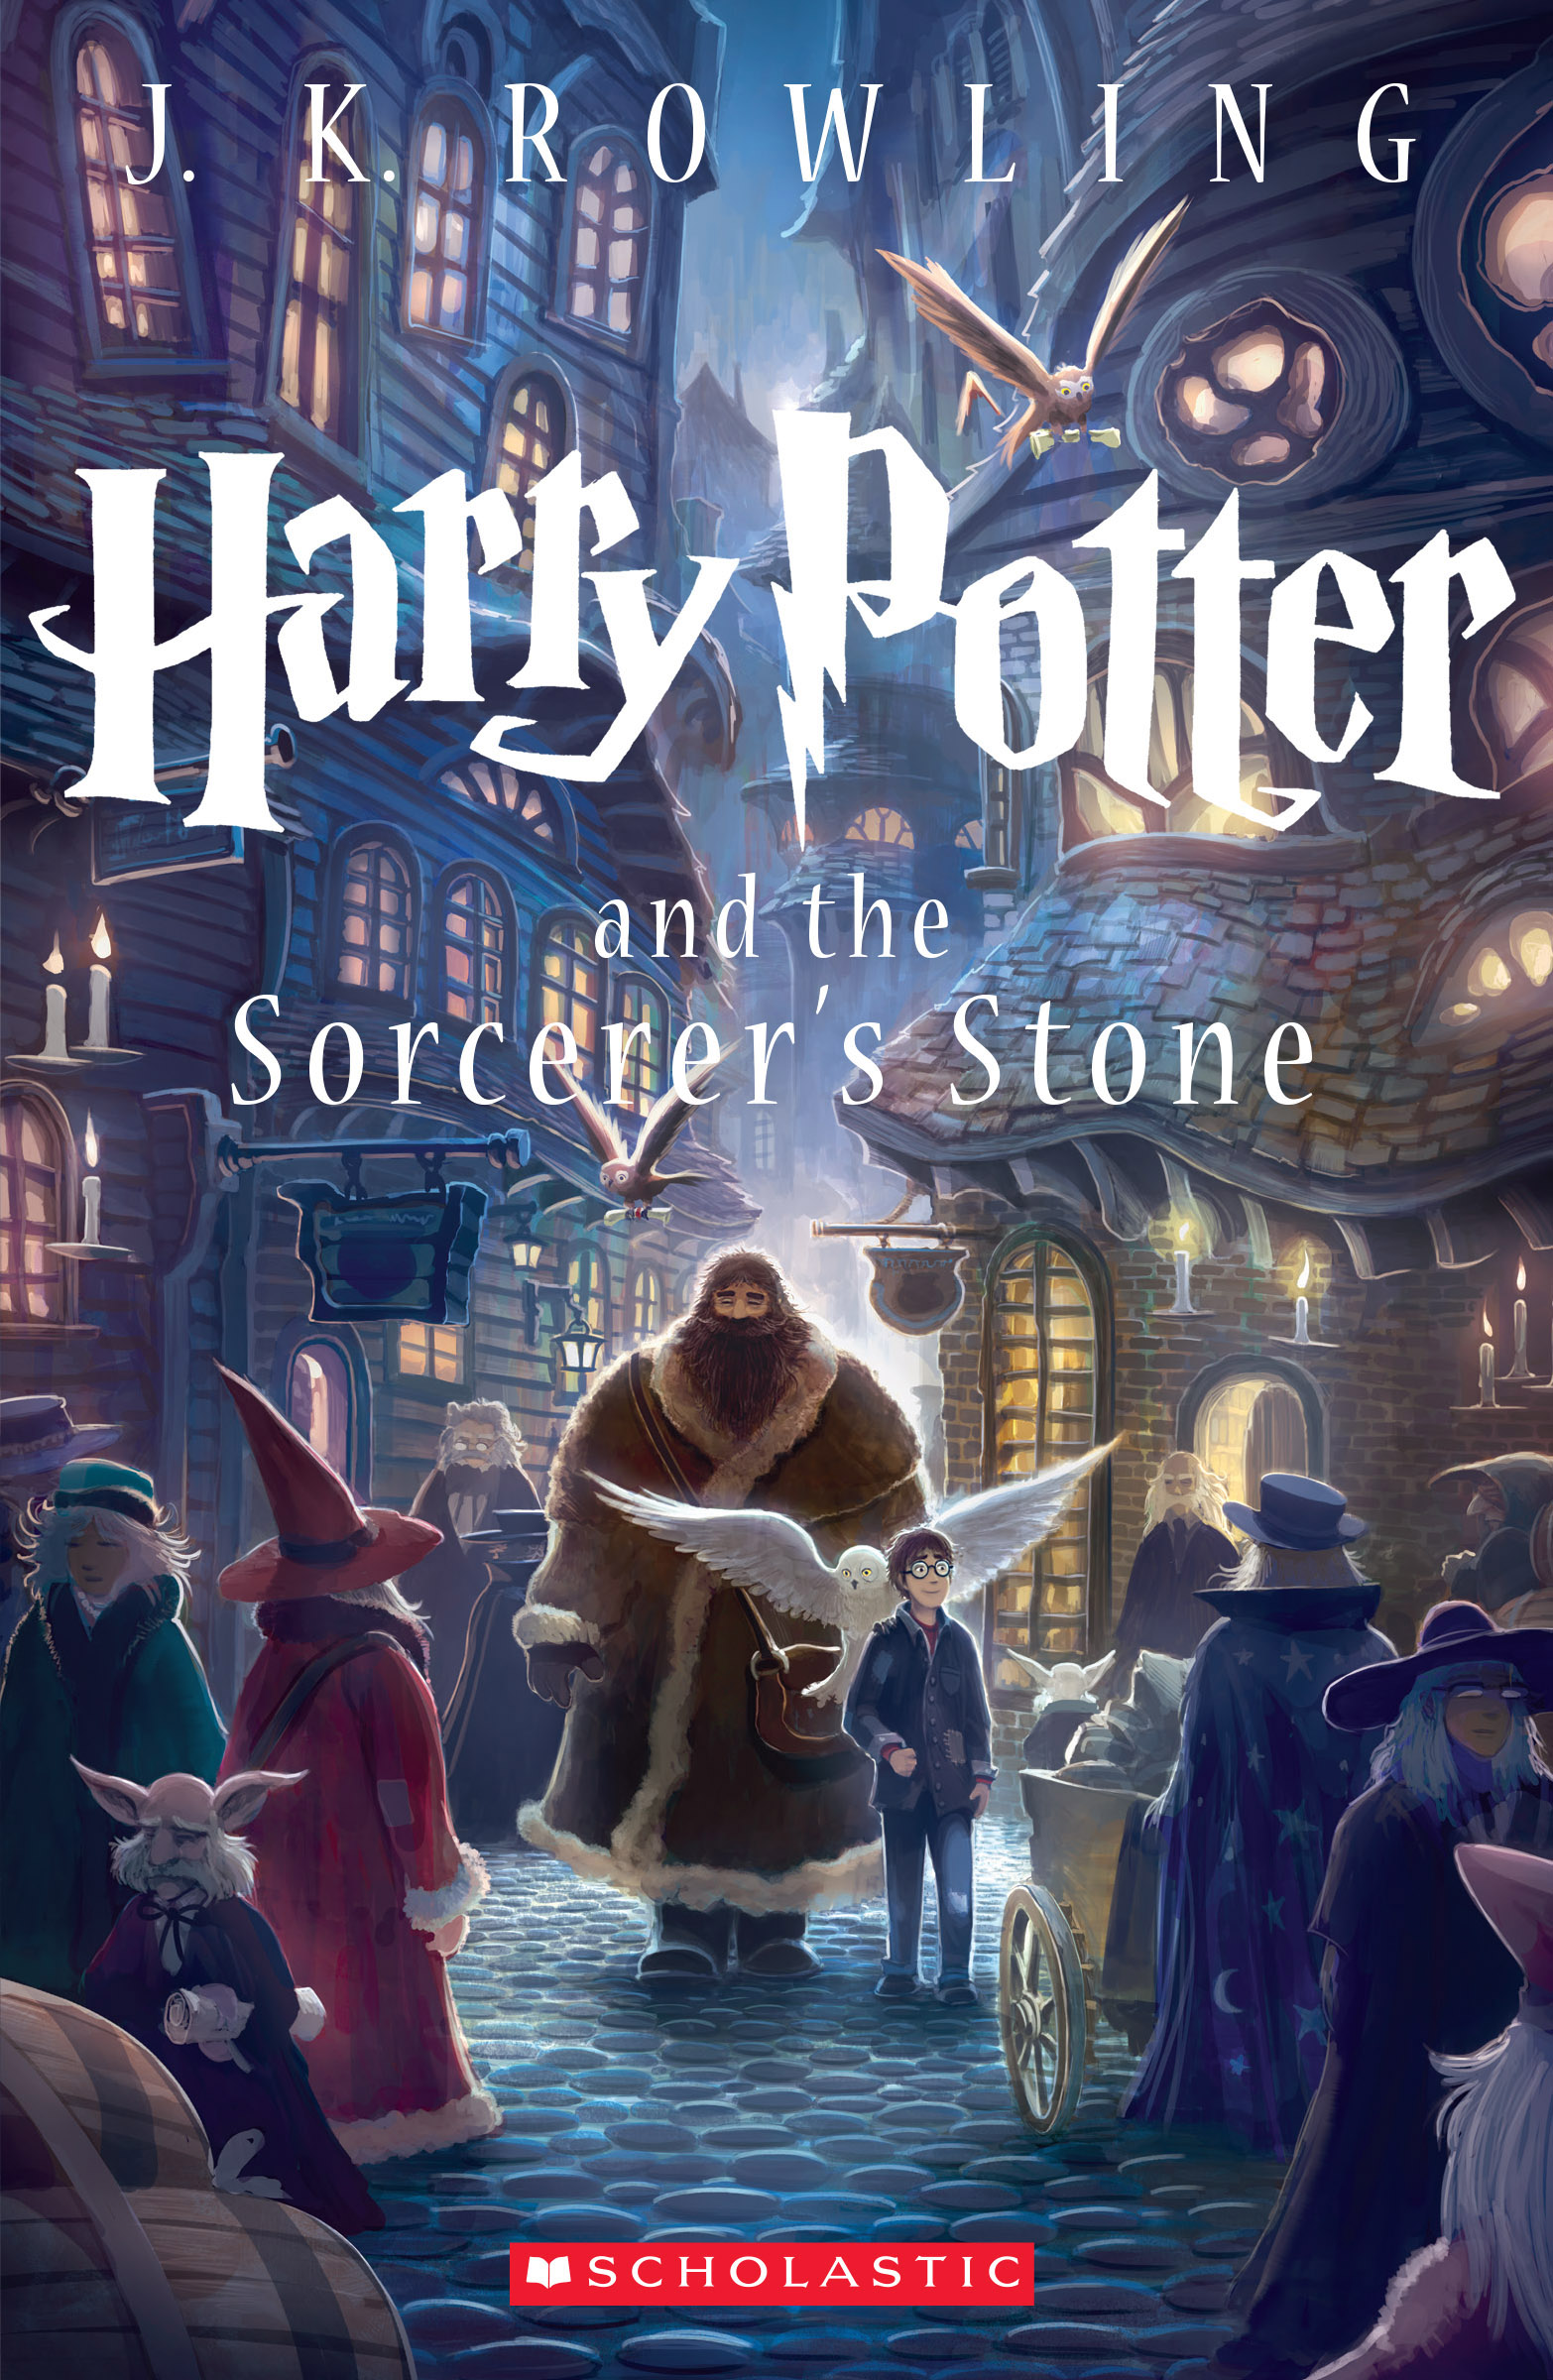 Special Edition Harry Potter Paperback Box Set Kkhp1-lg